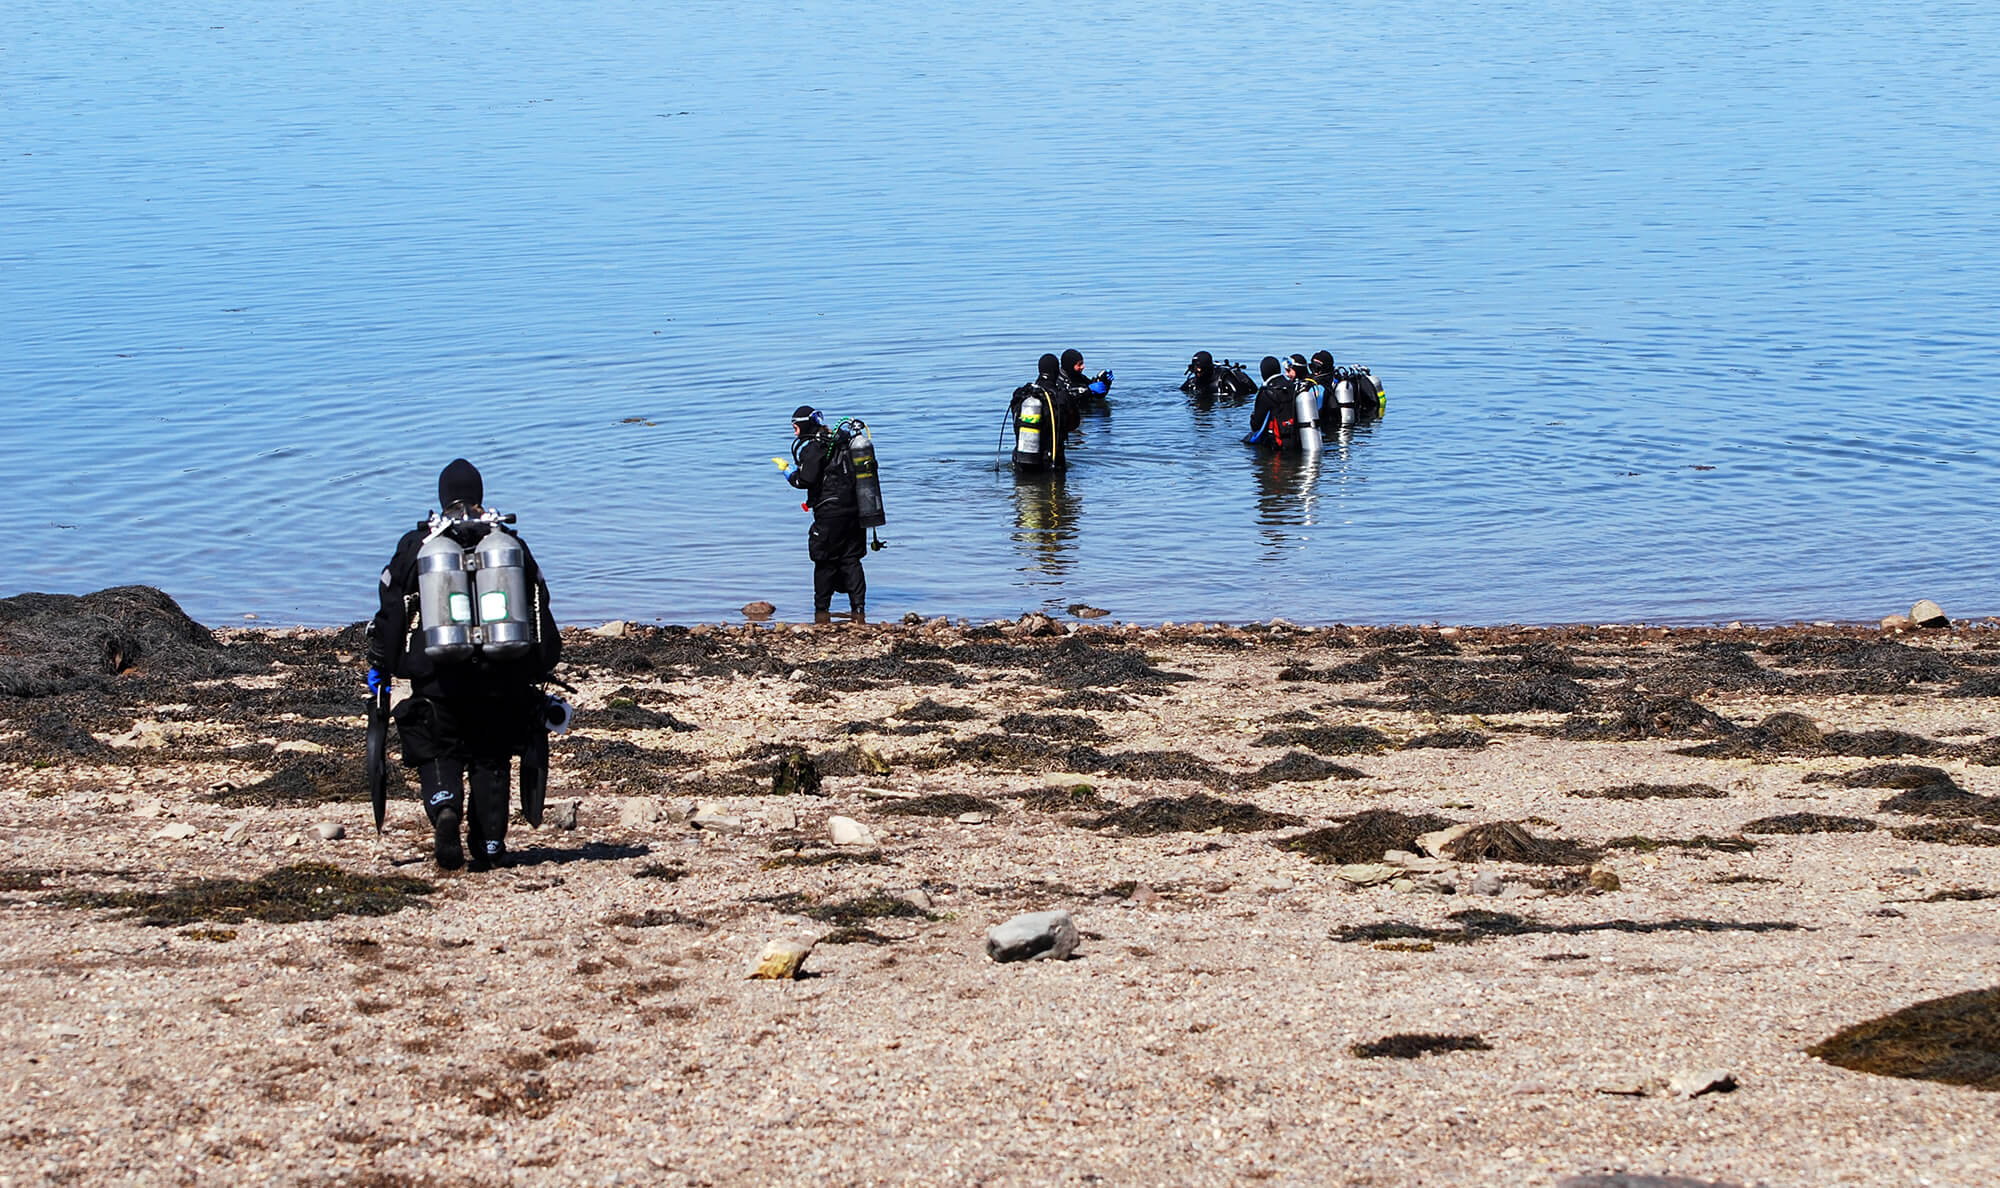 Canadian Scuba Divers on a Beach in New Brunswick